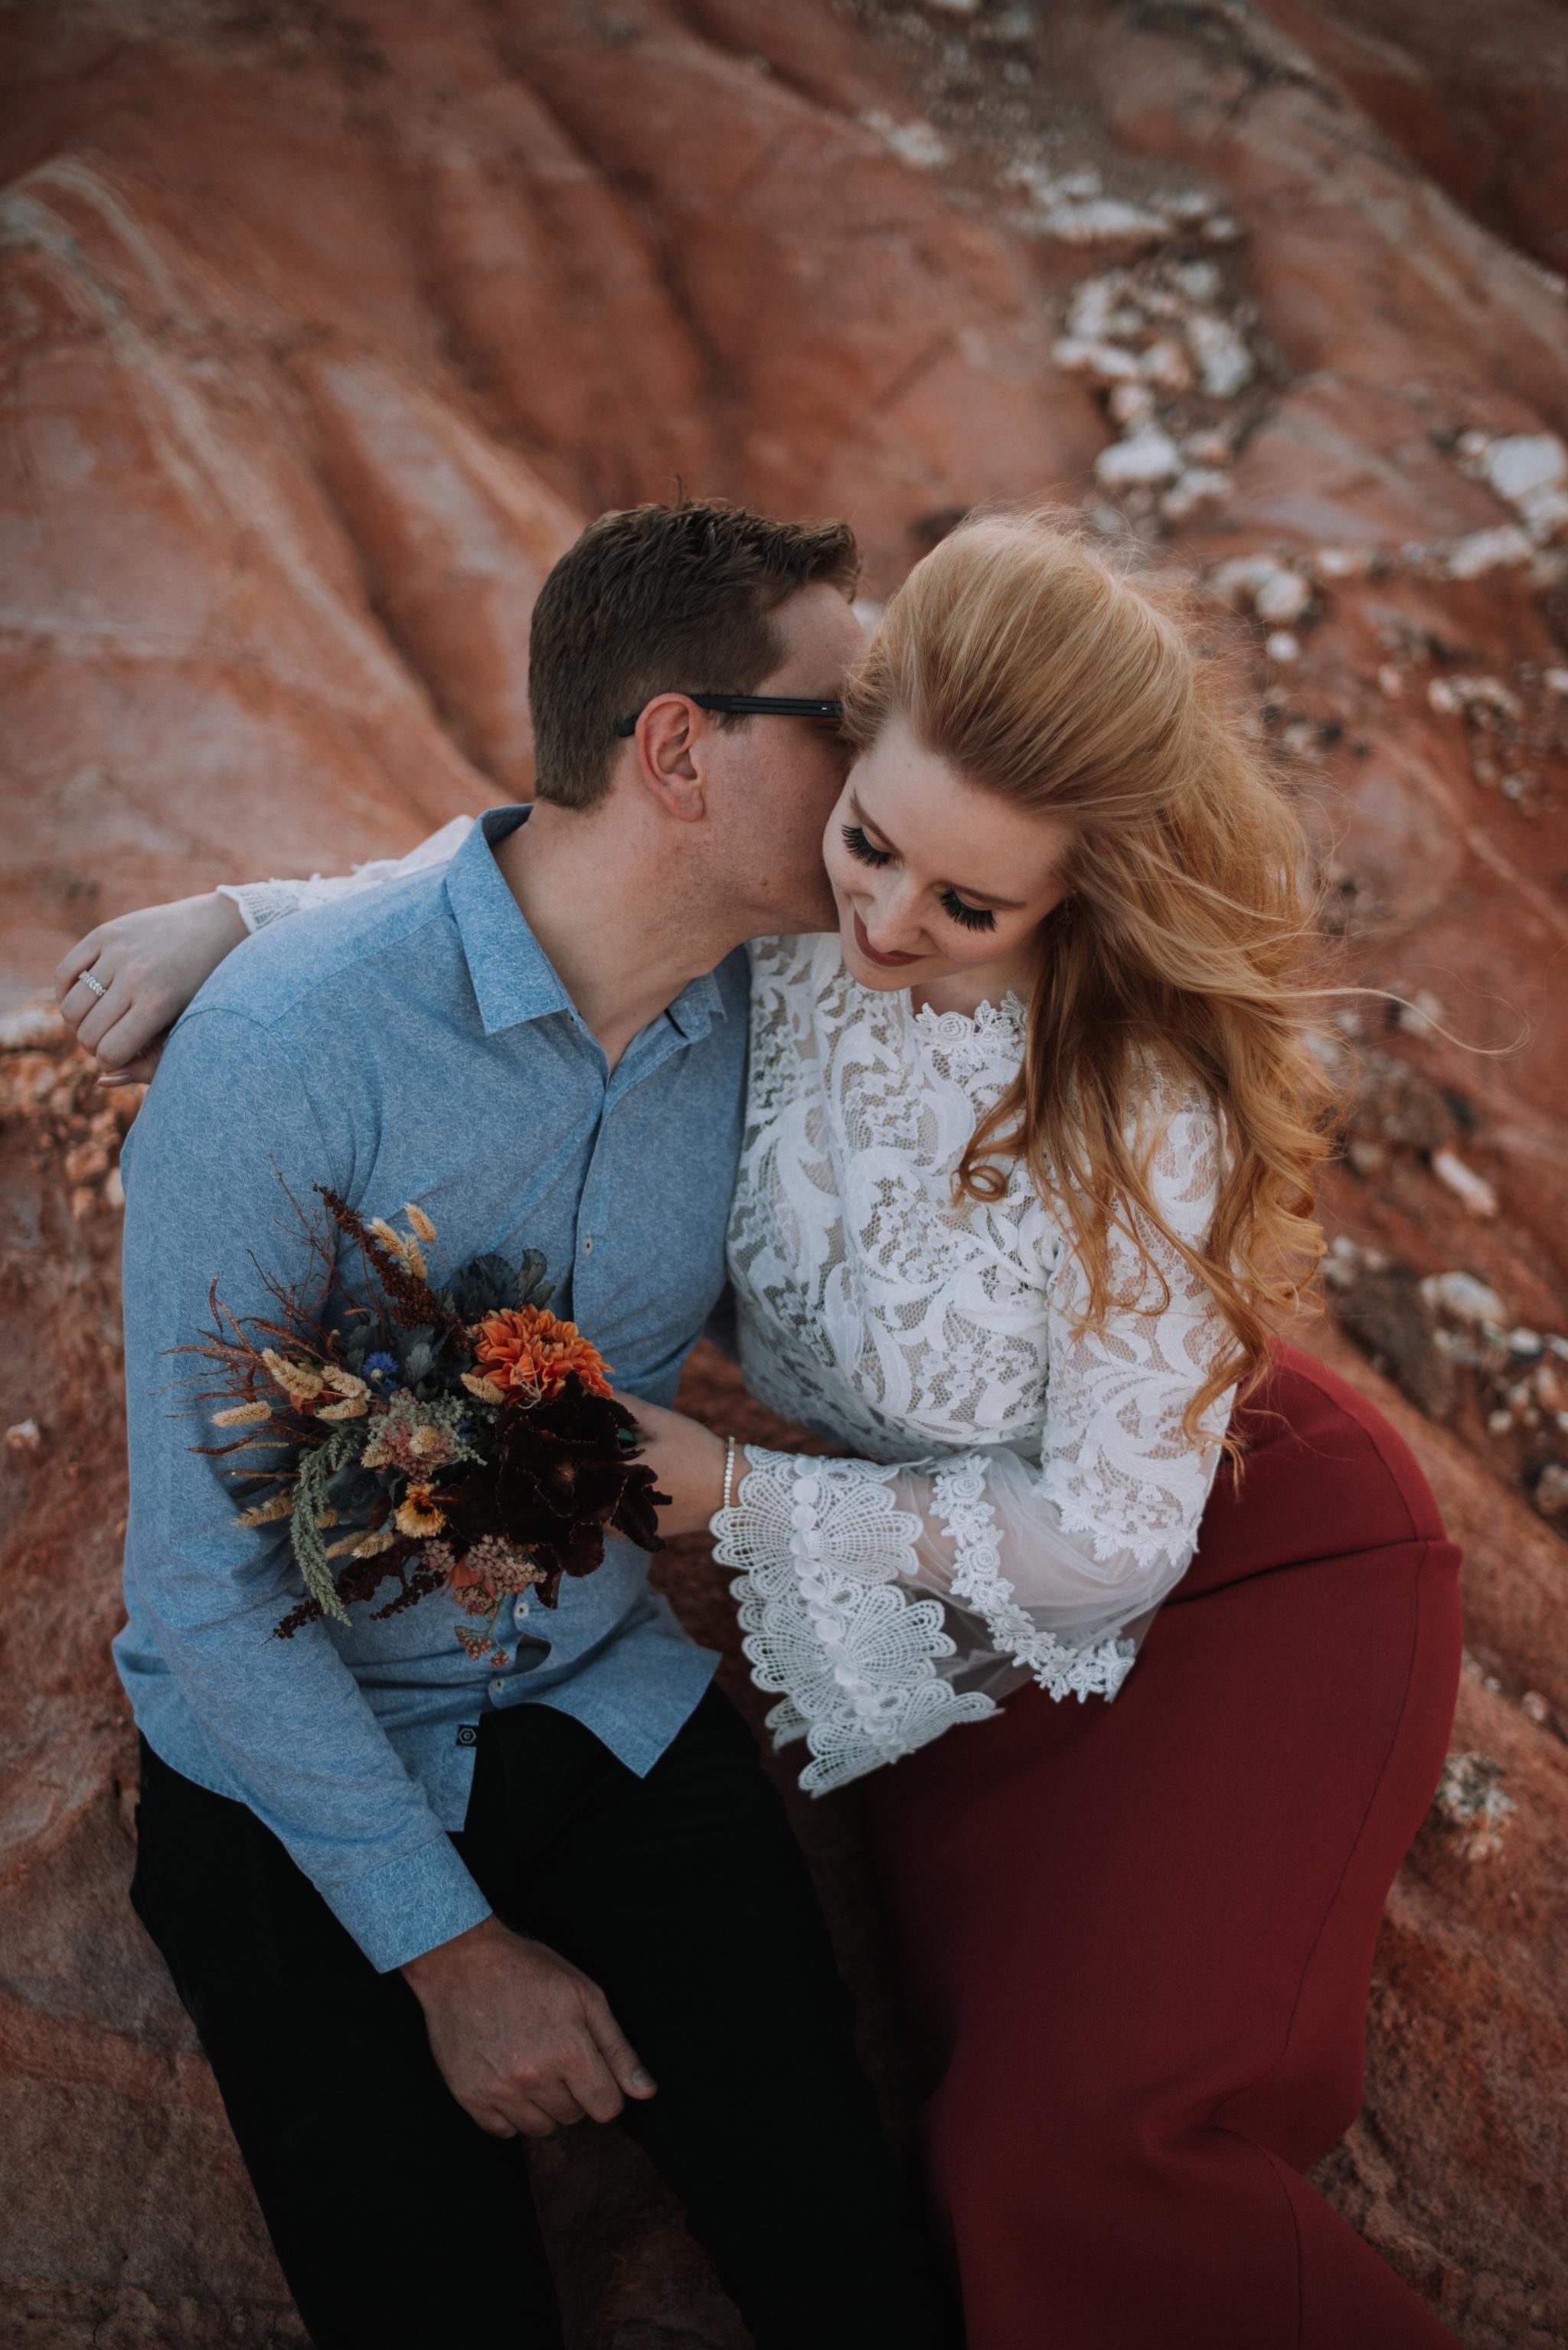 LOVELENSCAPES PHOTOGRAPHY • VISUAL POETRY • MELBOURNE WEDDING PHOTOGRAPHER • ALANNAH HILL DRESS • SUNSET ENGAGEMENT PHOTOS • PINK CLIFFS HEATHCOTE • FASHION EDITORIAL PHOTOGRAPHER • 15.jpg